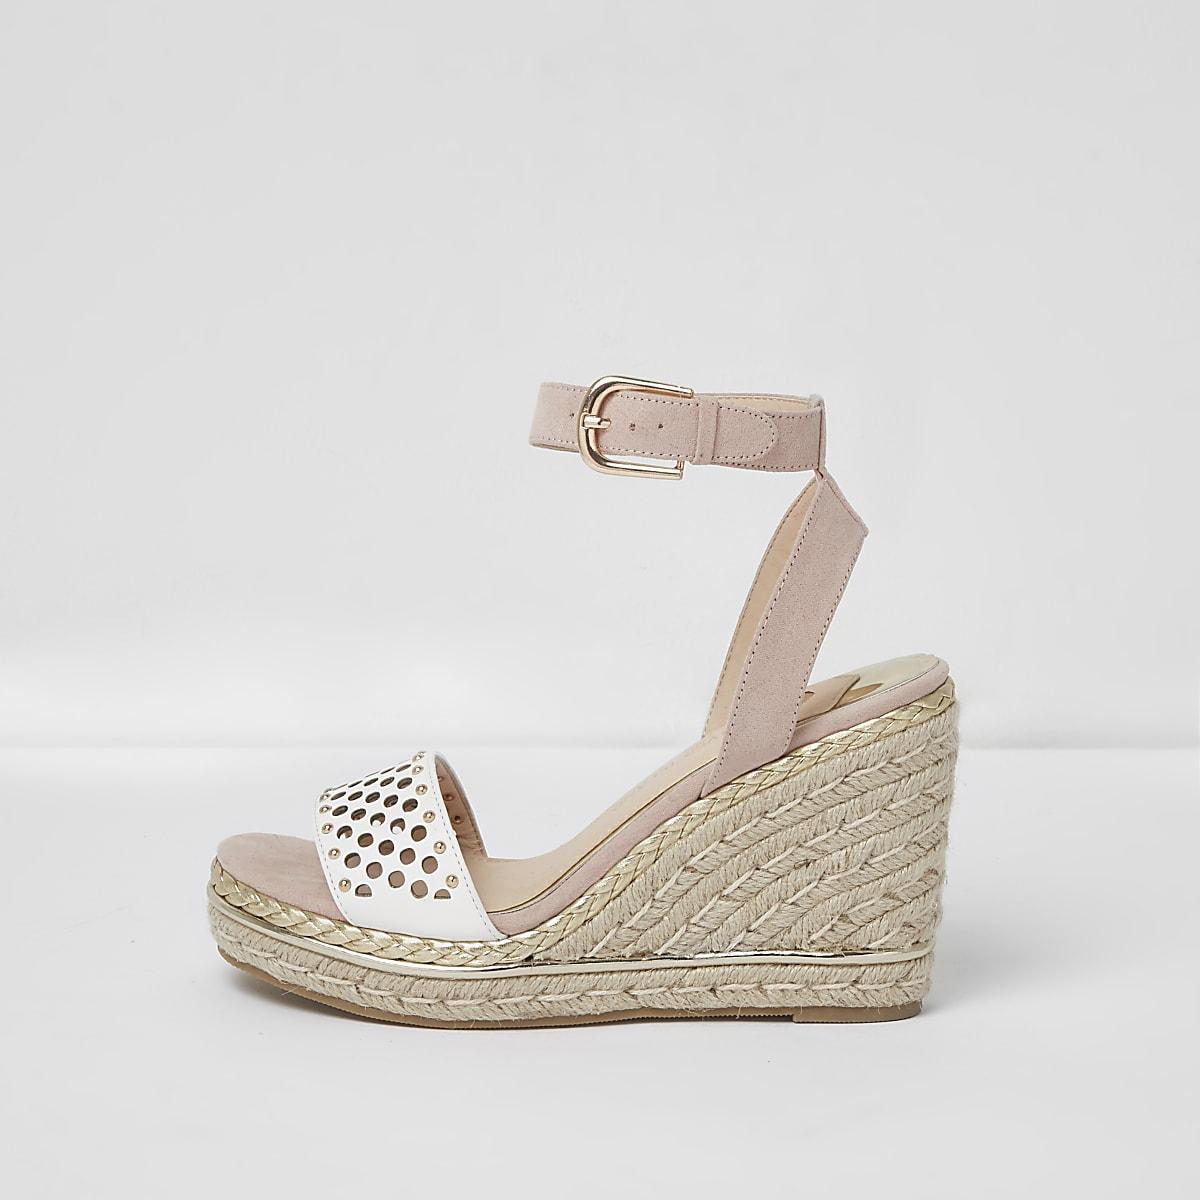 af3ada355 Pink laser cut studded espadrille wedges - Shoes - Shoes & Boots - women